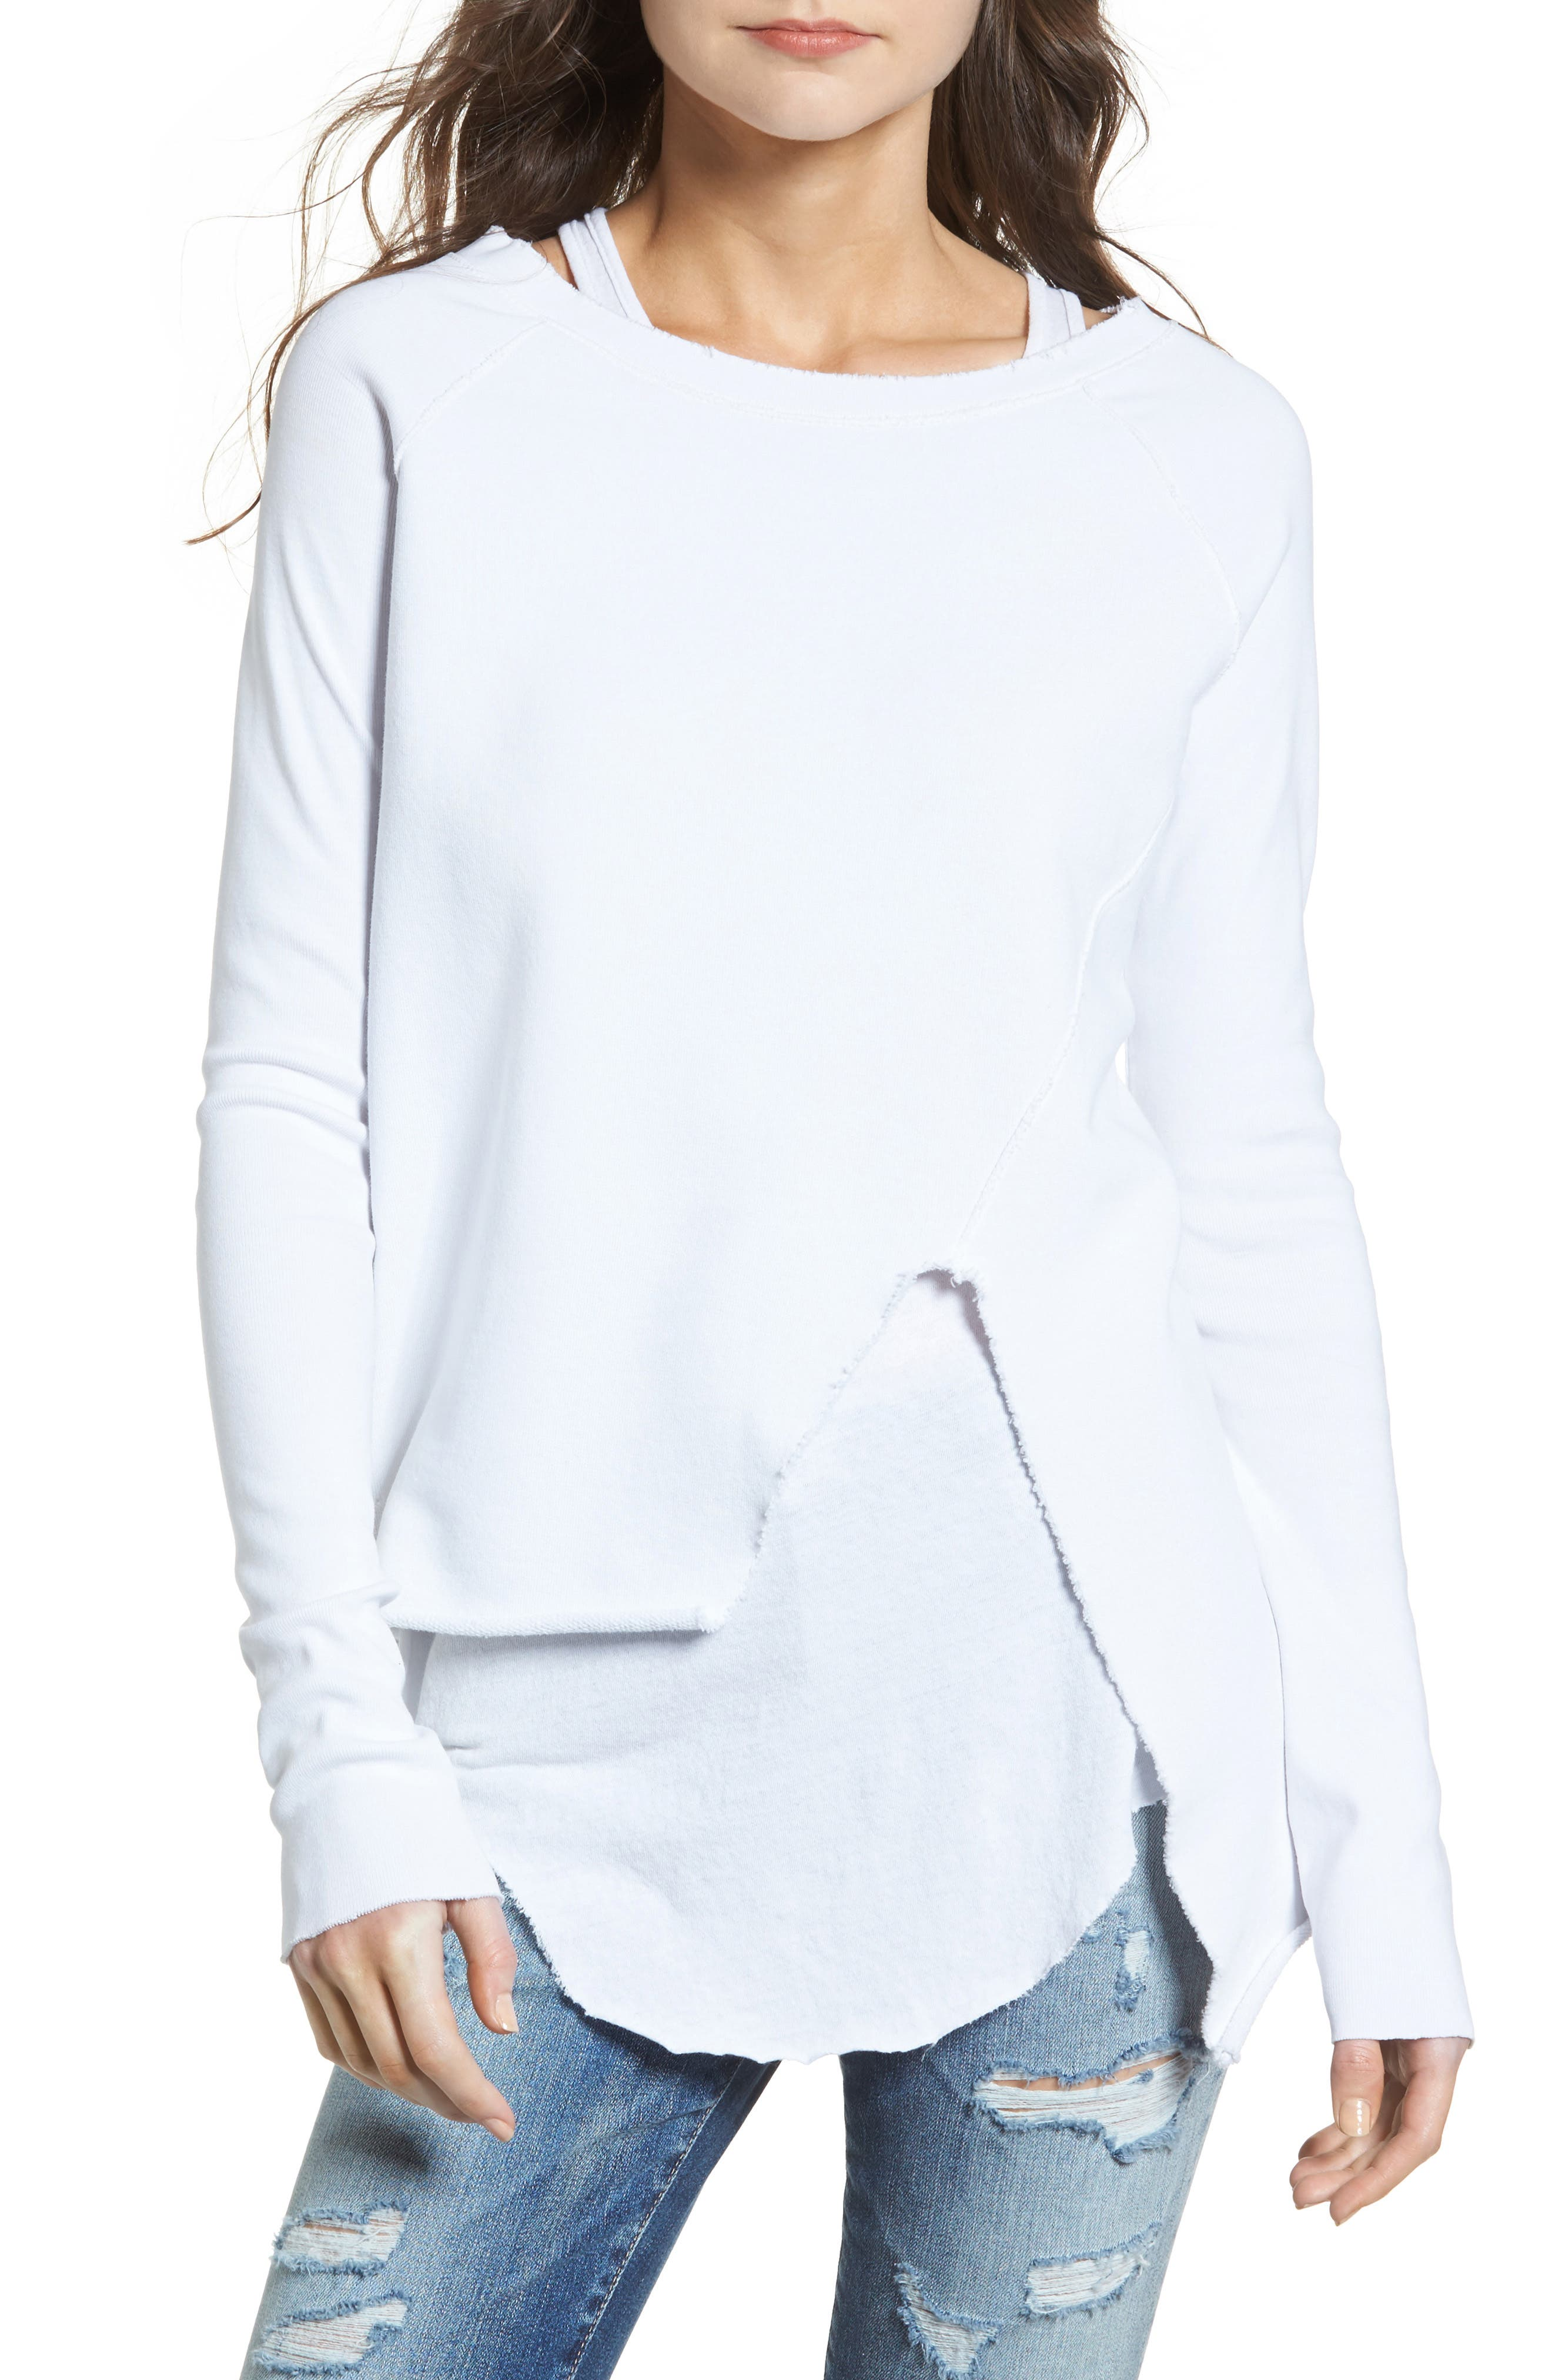 Tee Lab Asymmetrical Sweatshirt,                         Main,                         color, Dirty White